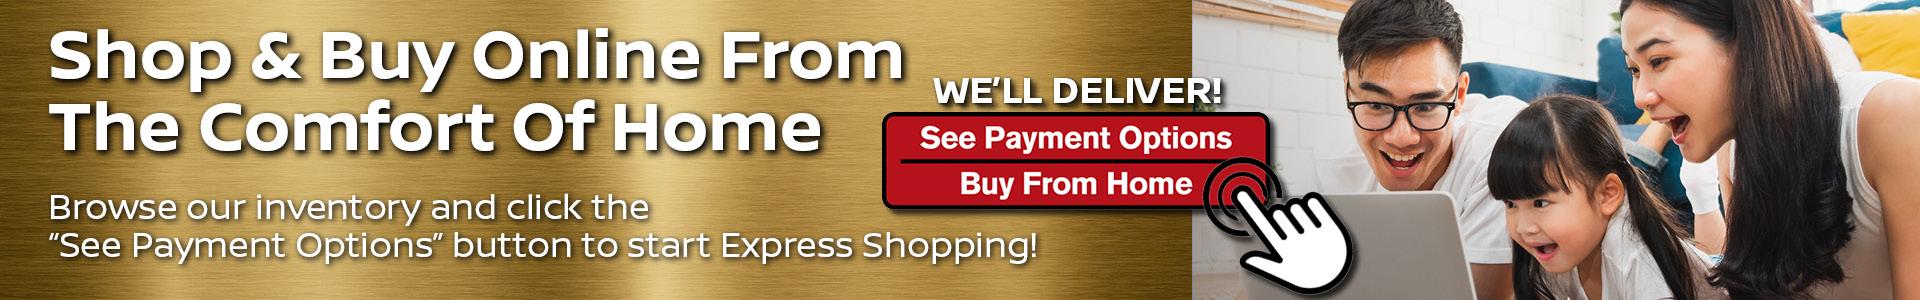 Mossy Nissan - Shop Online SRP